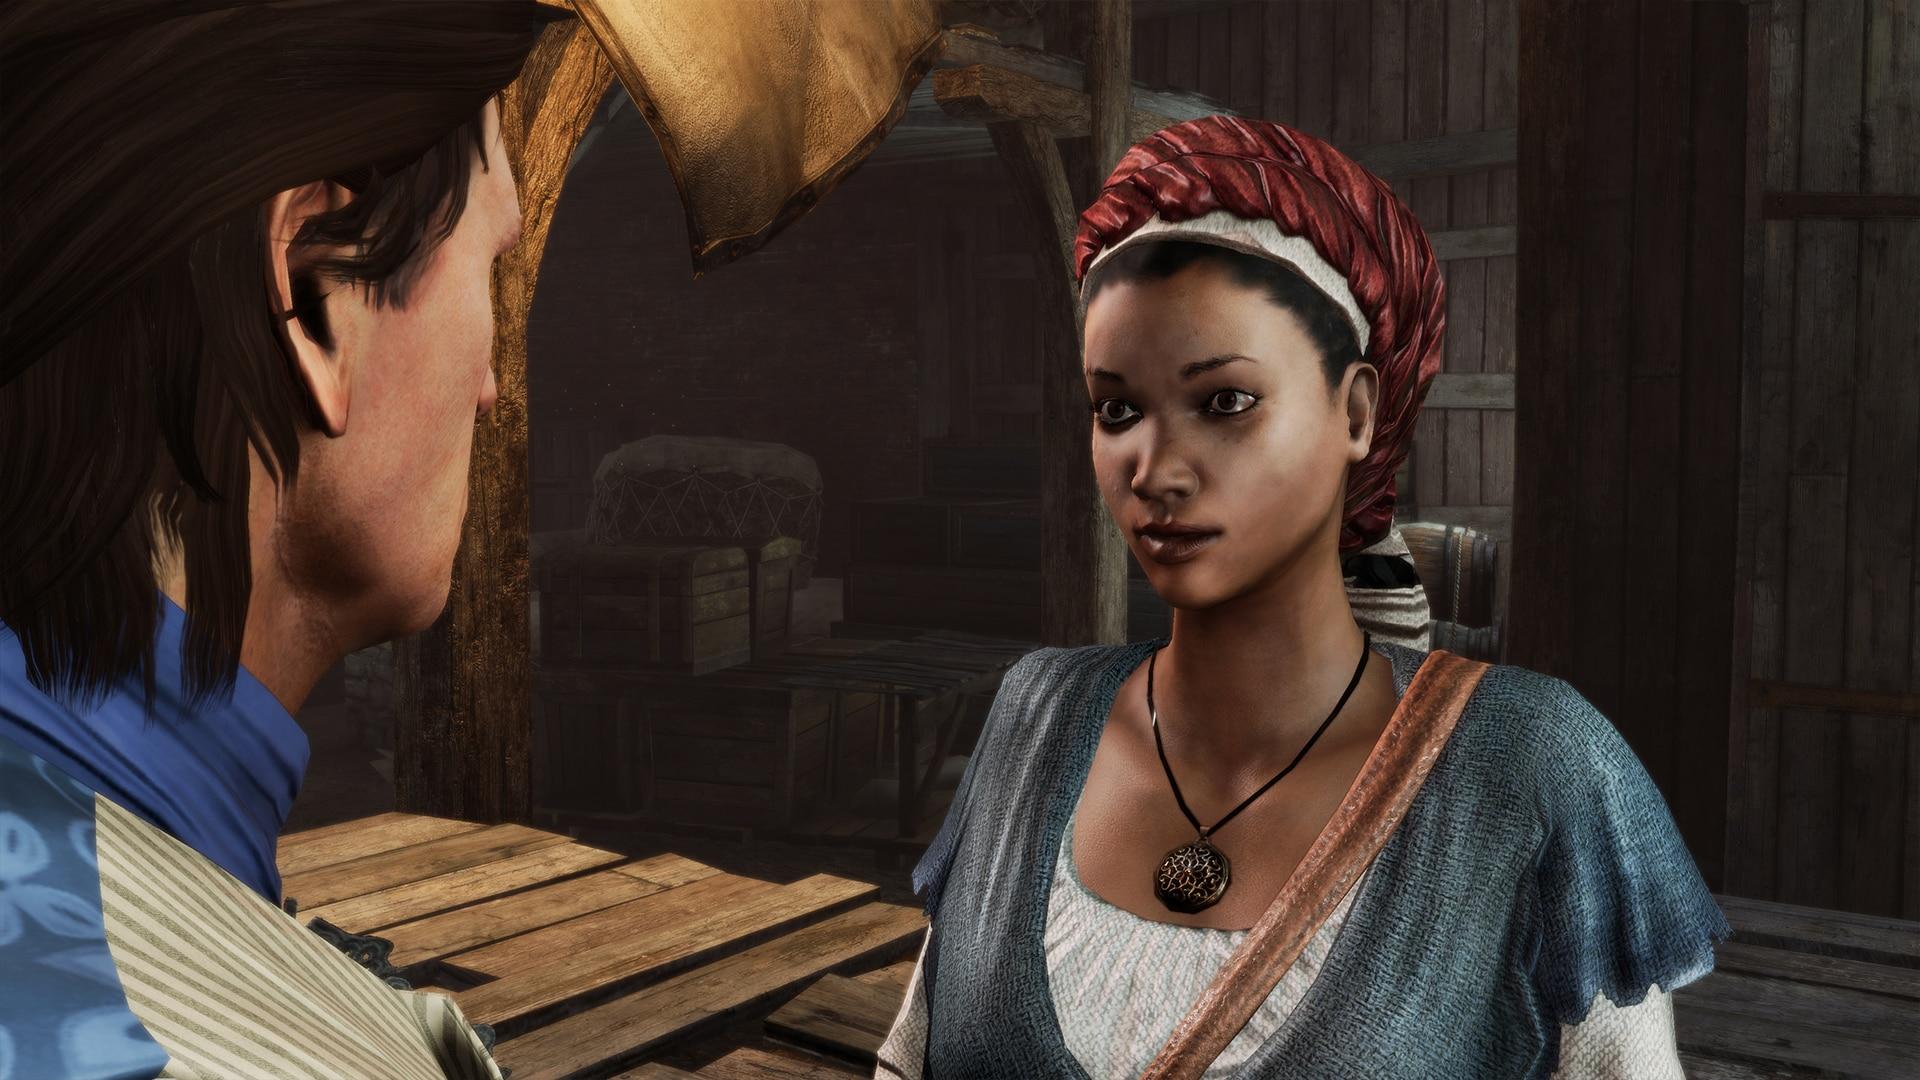 Assassin's Creed III: Remastered (Nintendo Switch) - Nintendo Key - UNITED STATES - 3